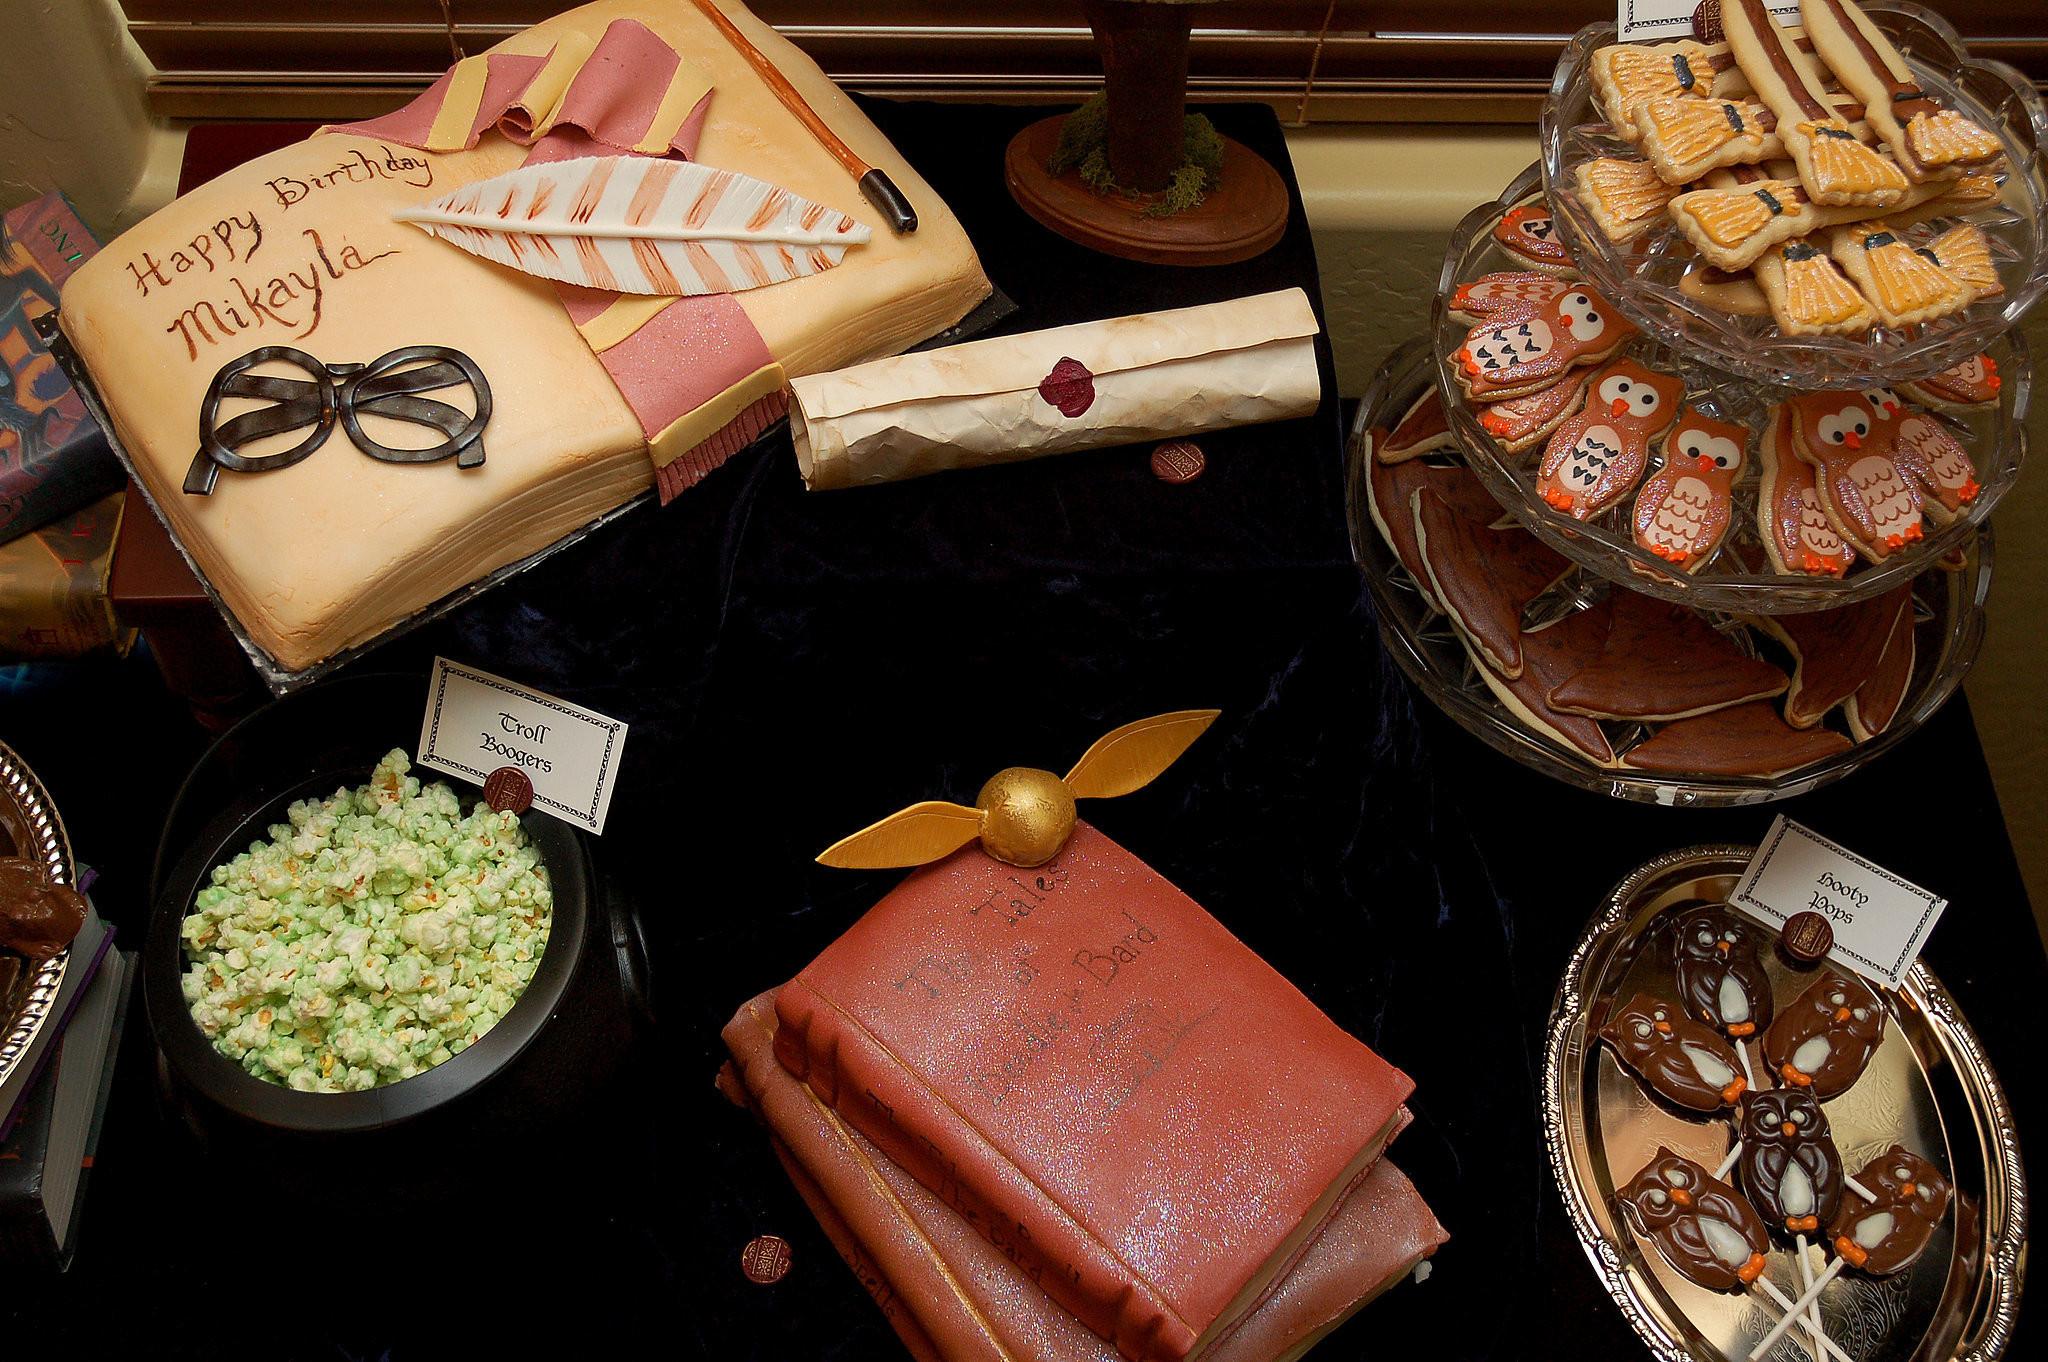 Harry Potter Desserts  Harry Potter Dessert Table